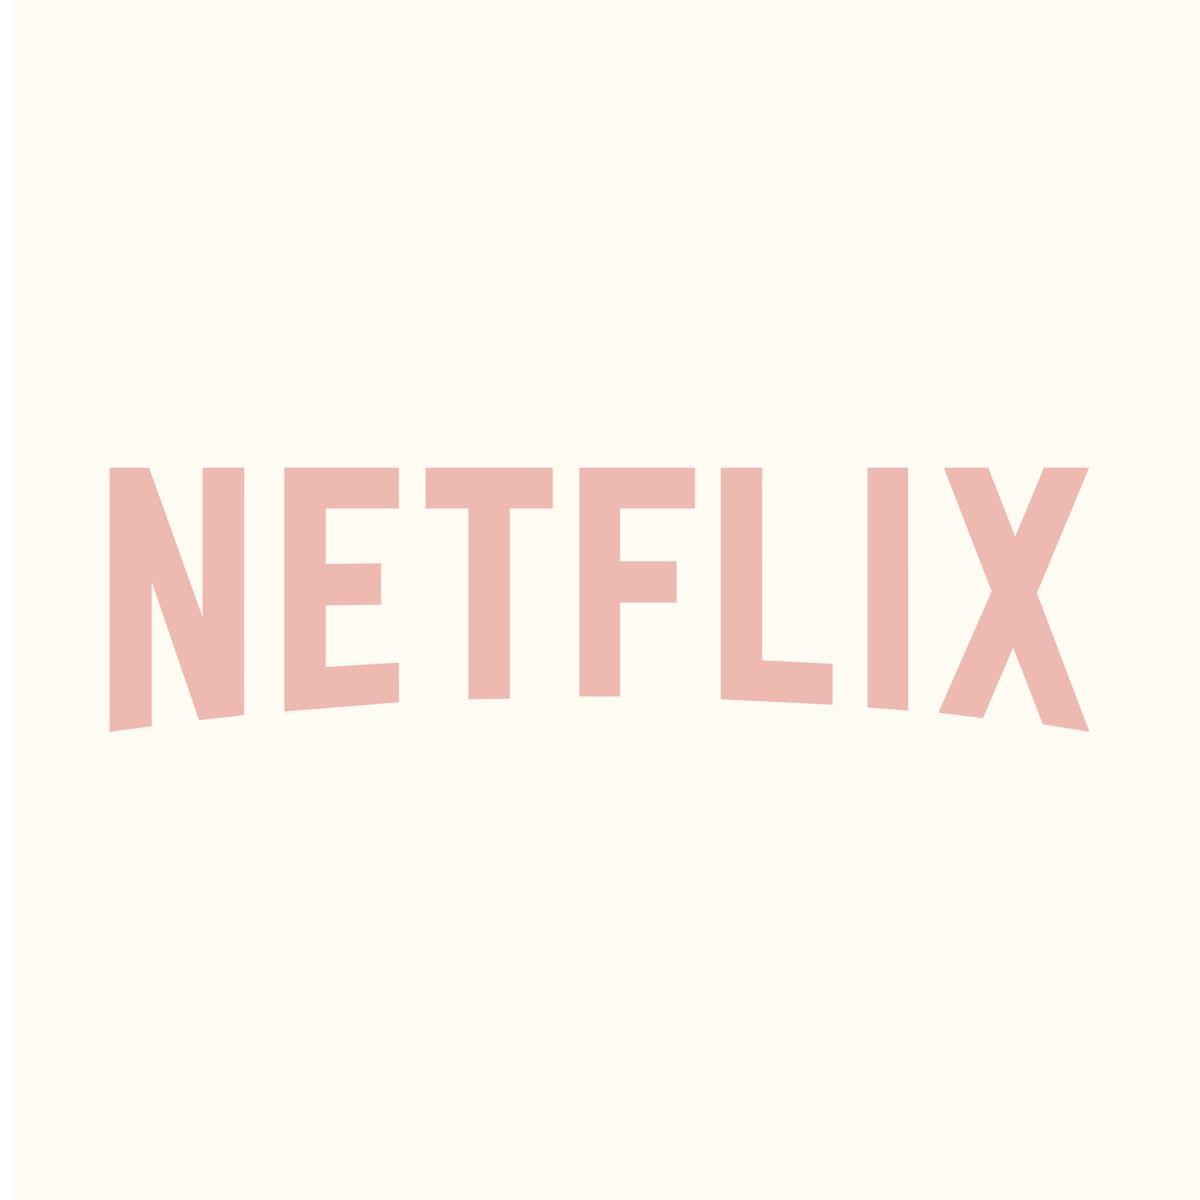 Netflix App Icon App Icon Netflix App Wallpaper App Netflix app icon aesthetic green. netflix app icon app icon netflix